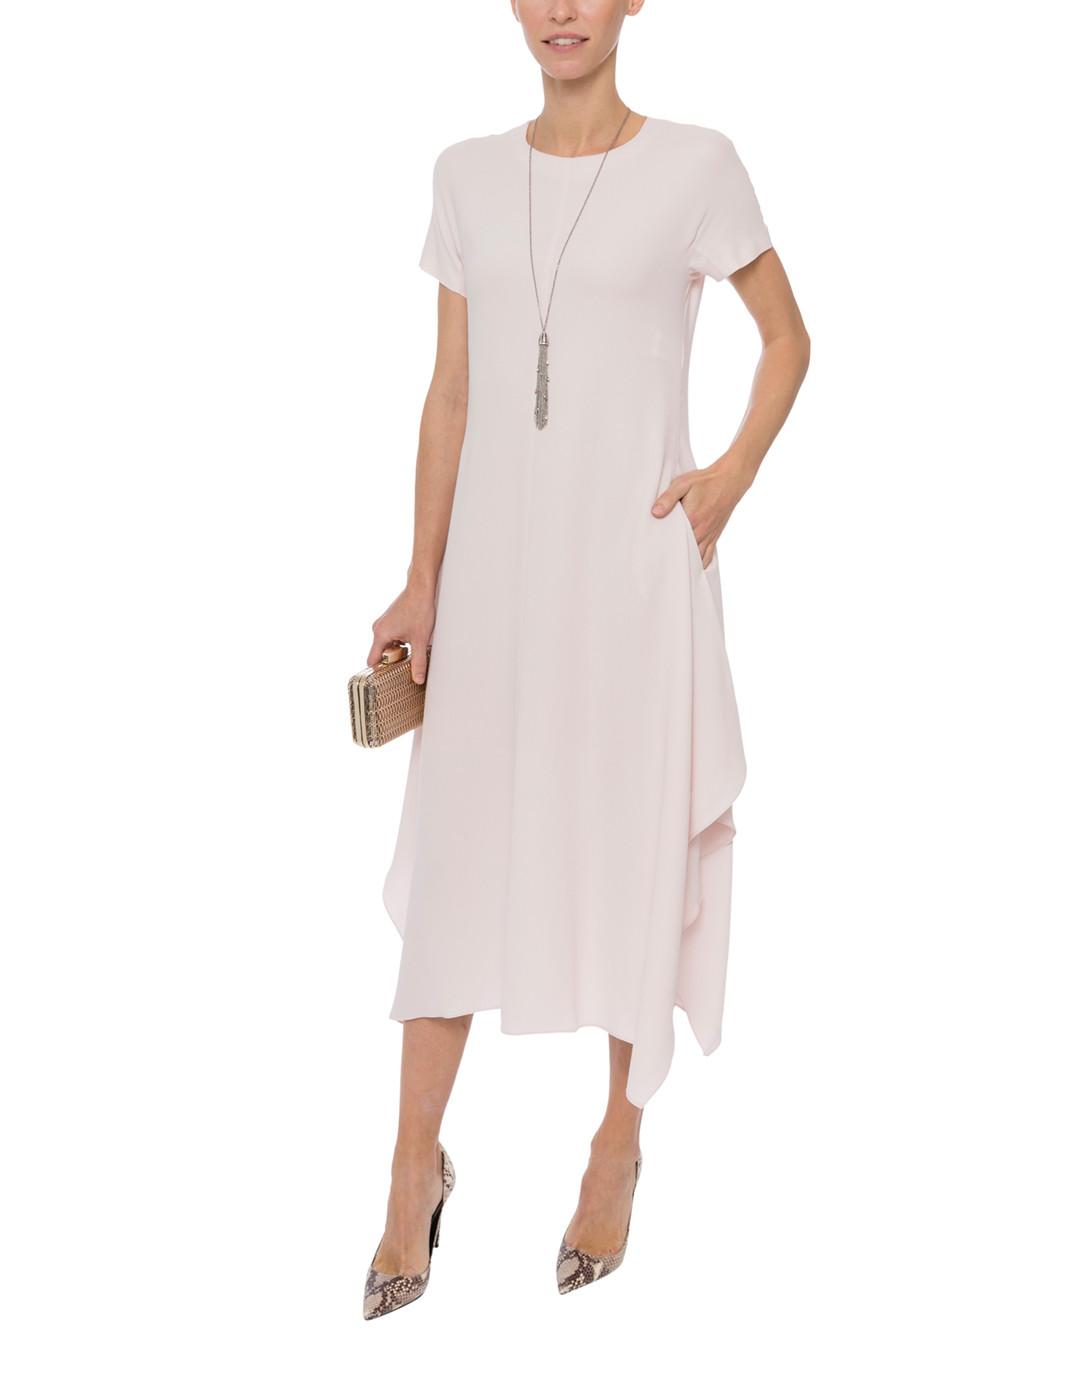 fb49e878349 Pale Pink Cady Dress